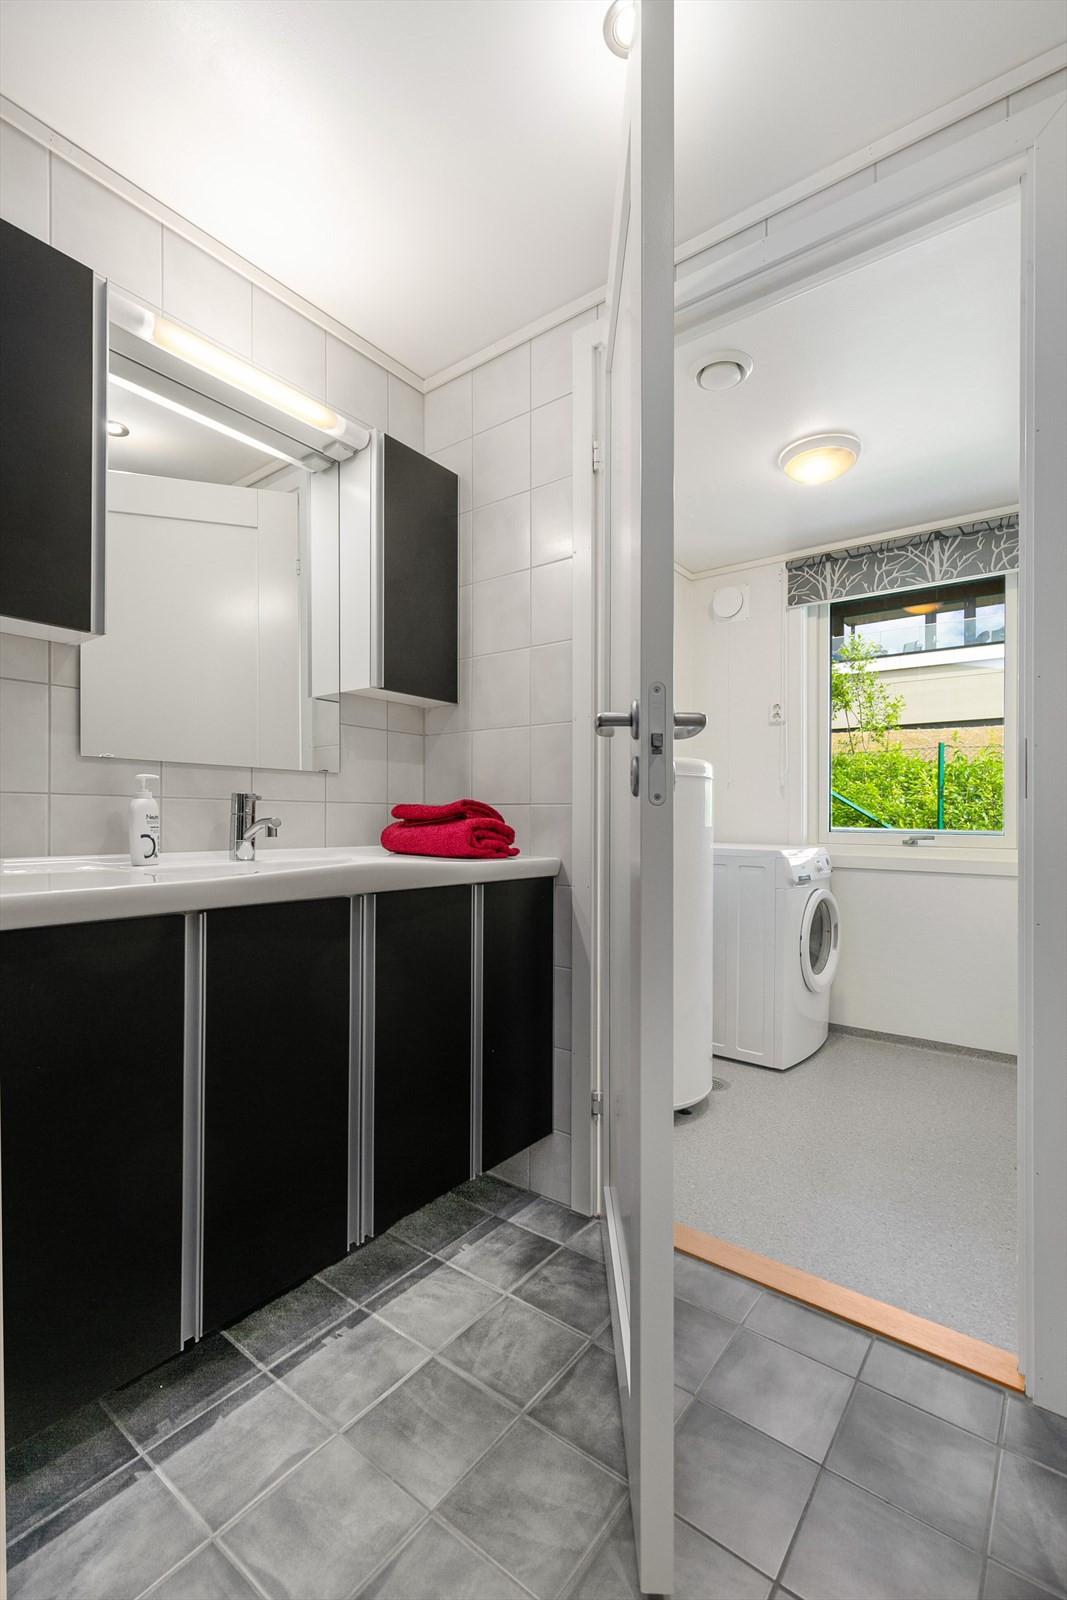 Flislagt badrom med vaskerom tilknyttet.